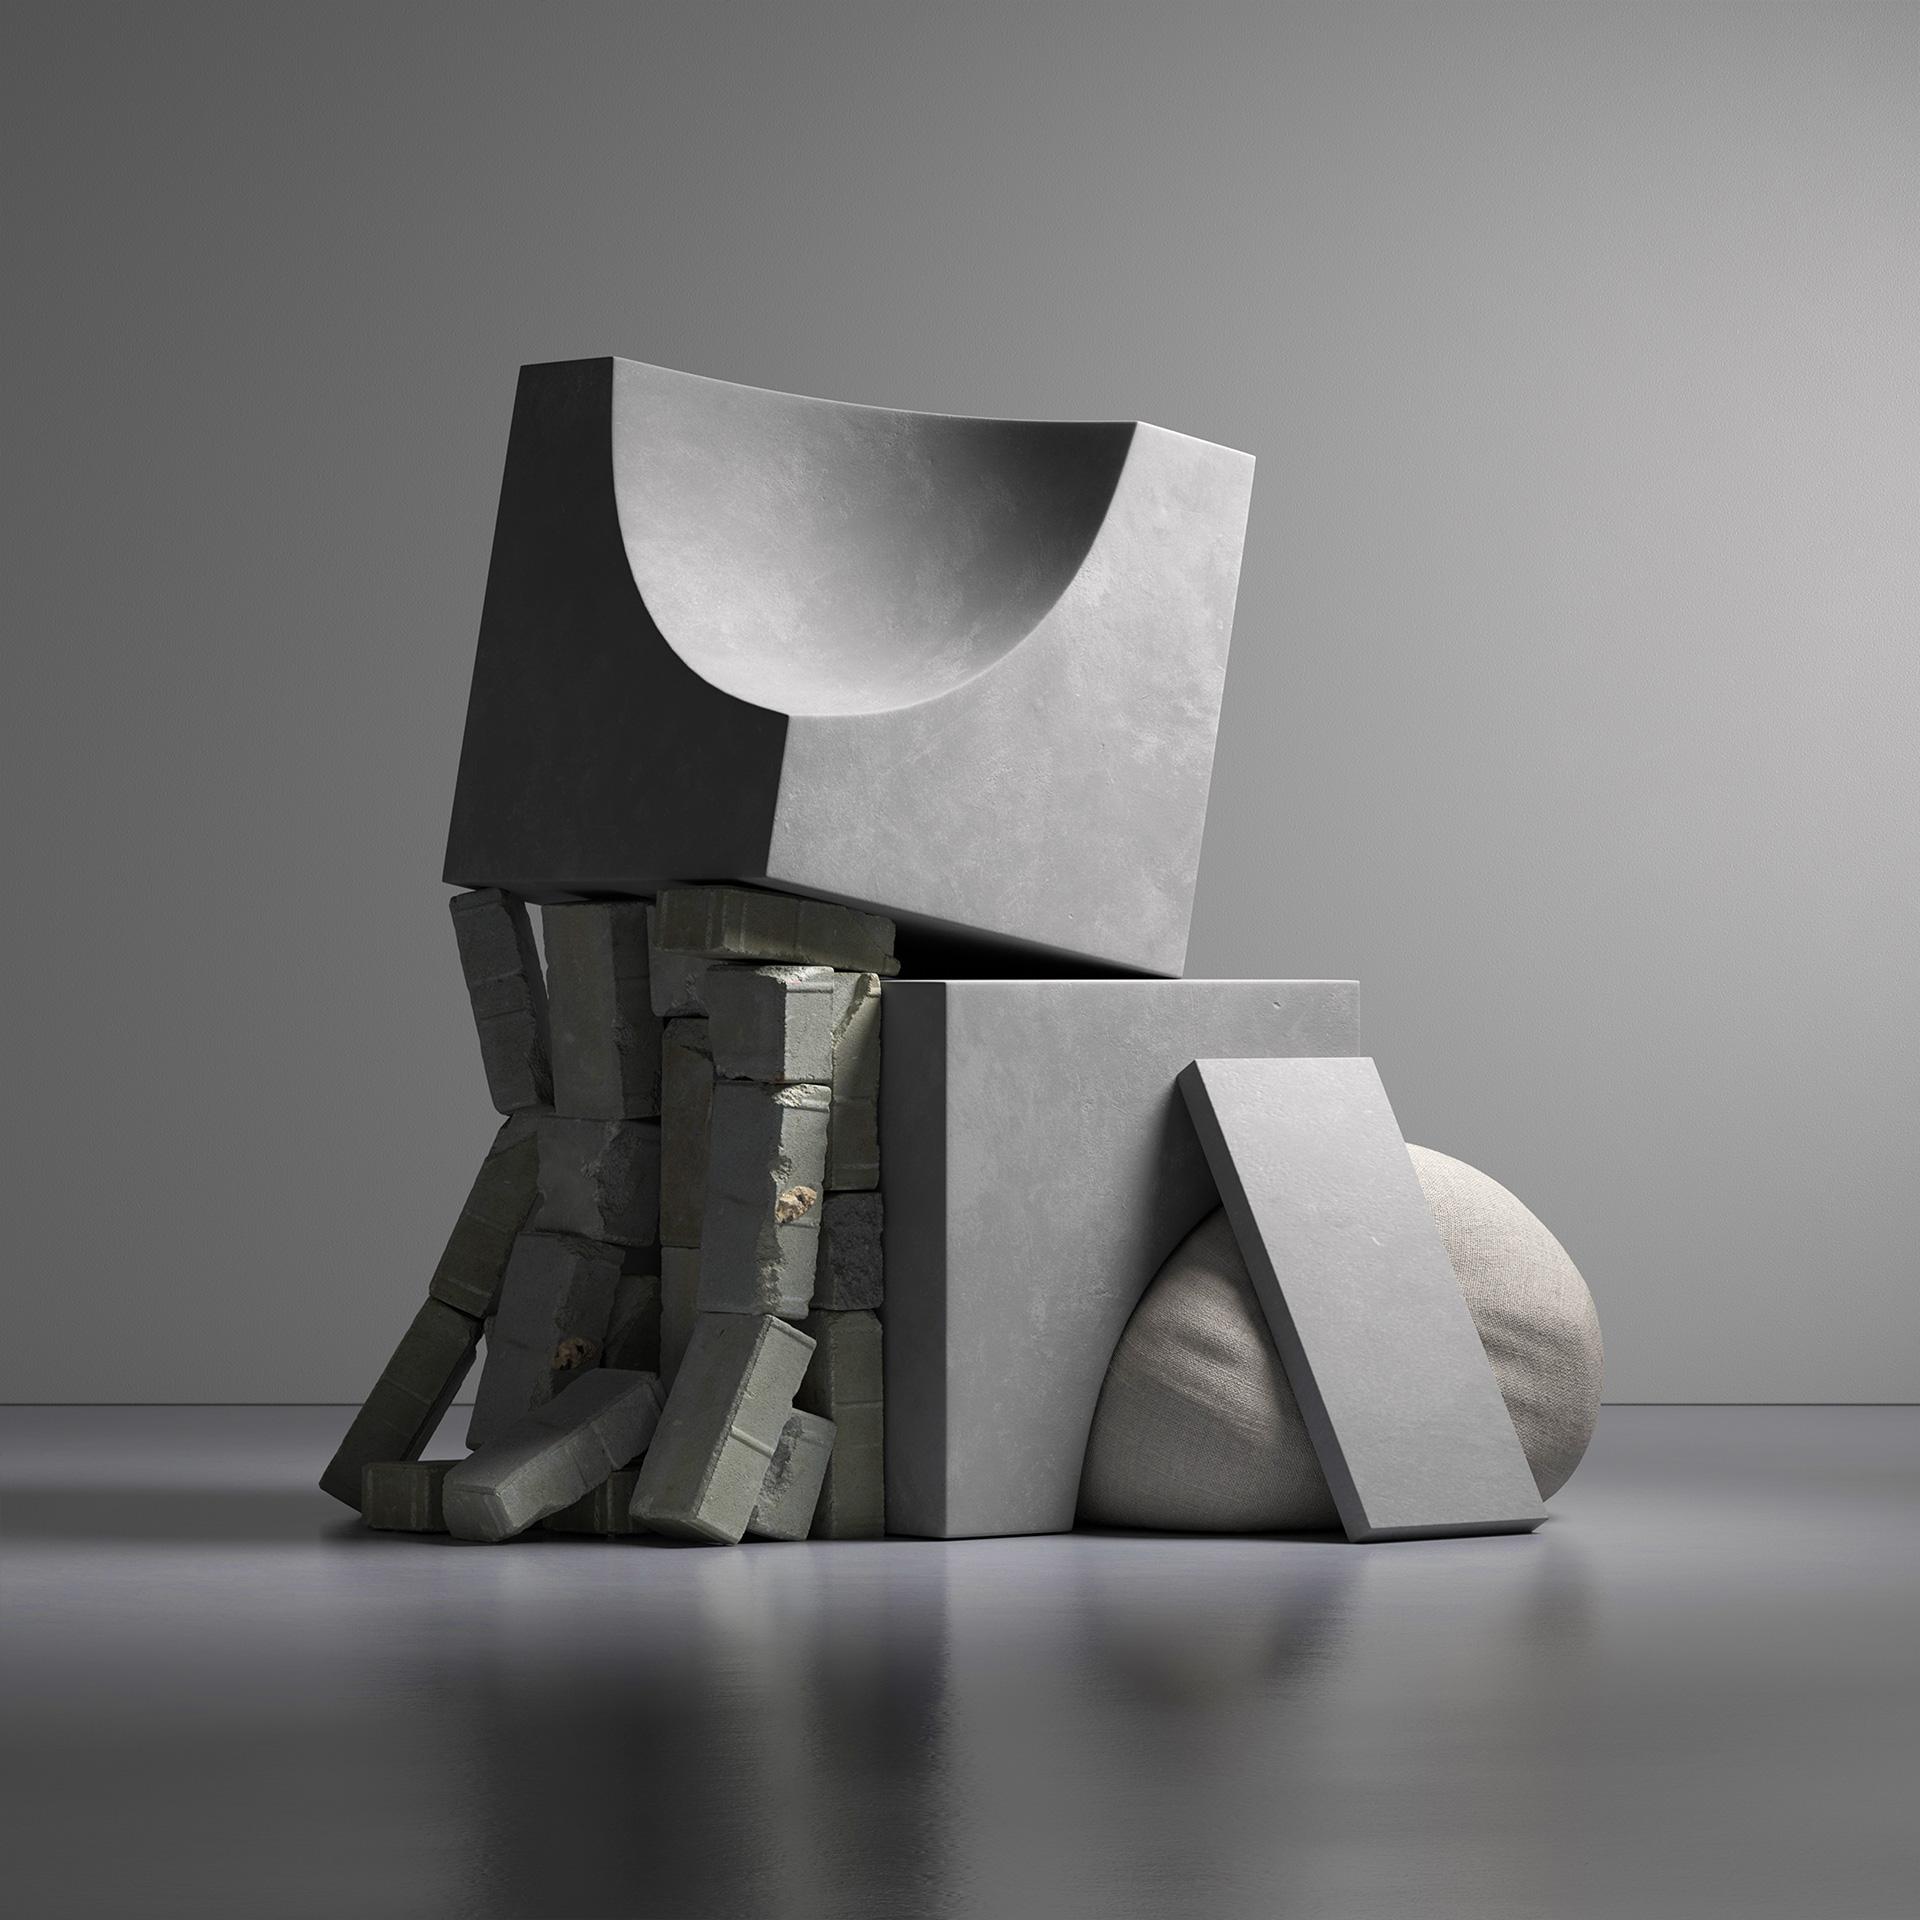 Stack Sculpture